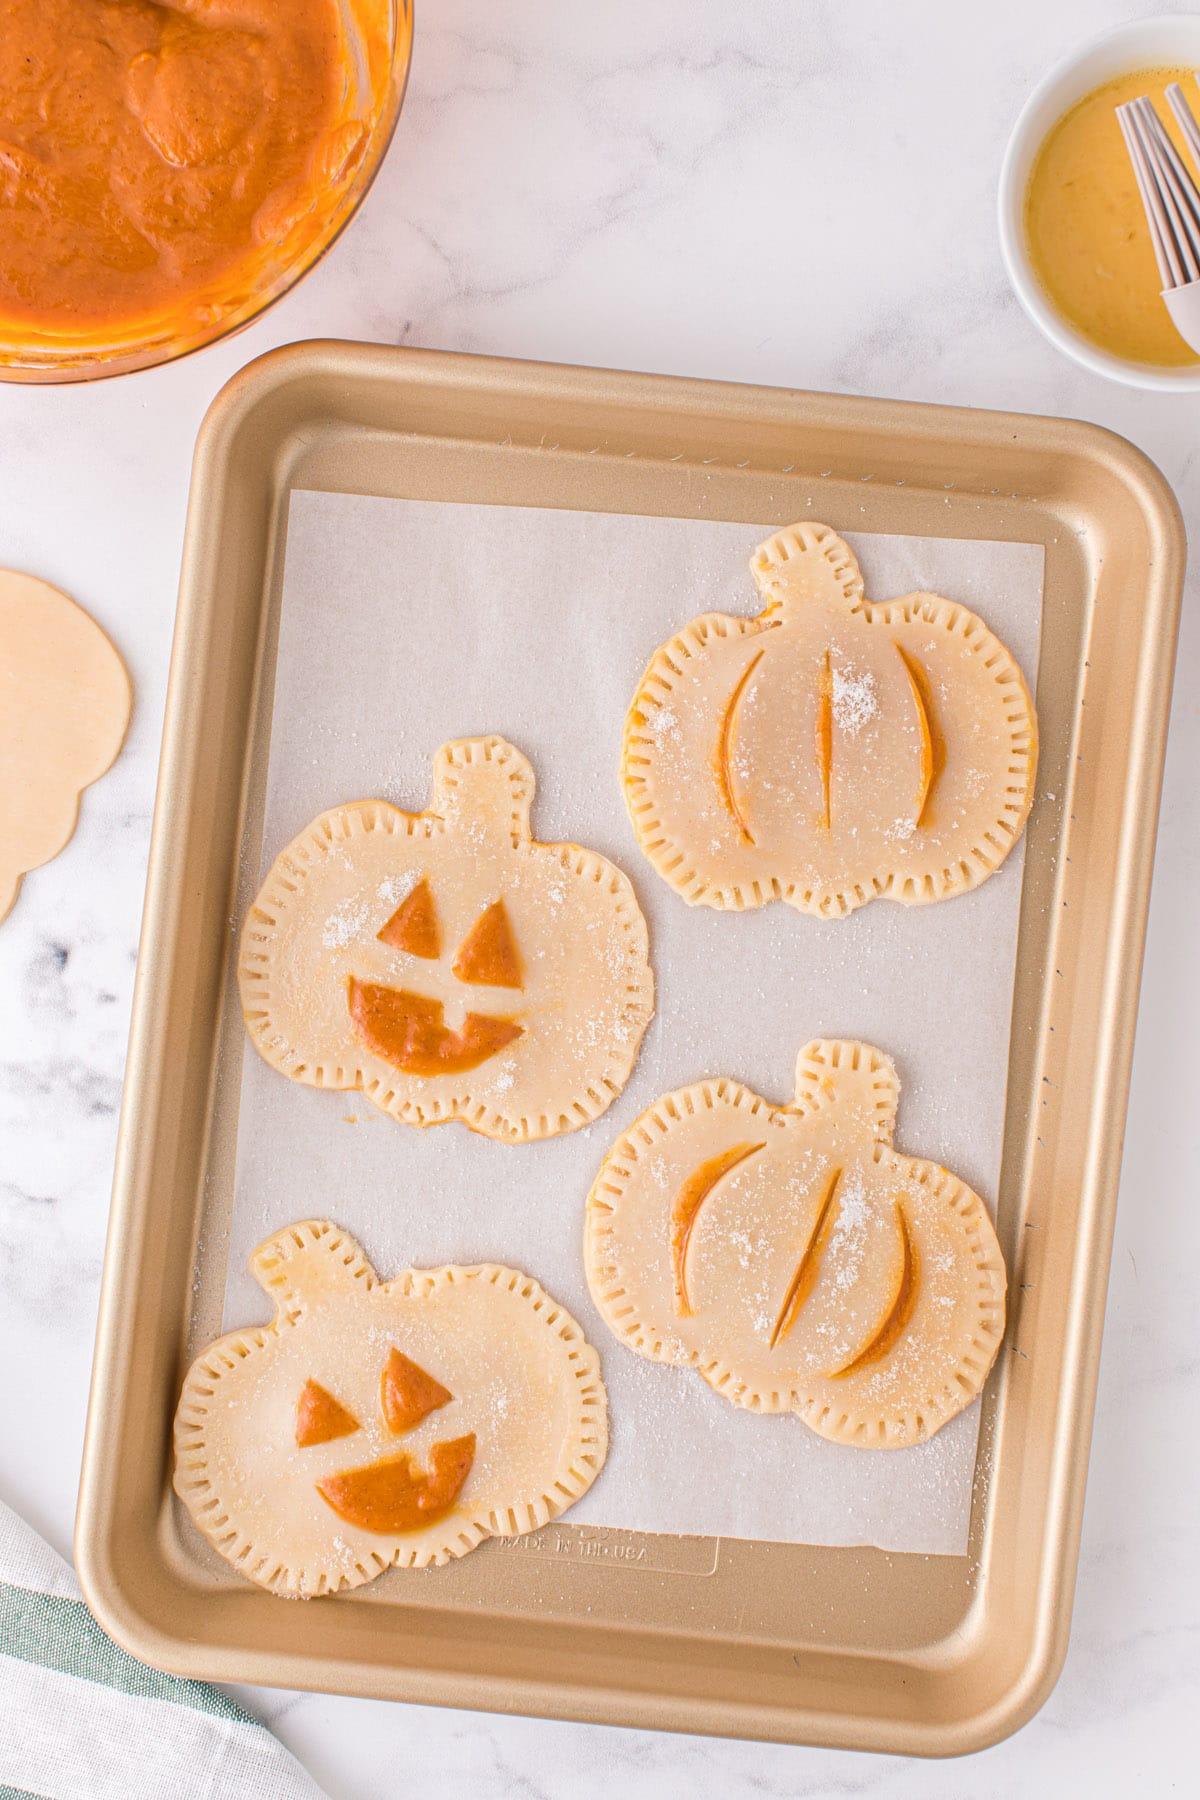 Top each half with another pumpkin piece